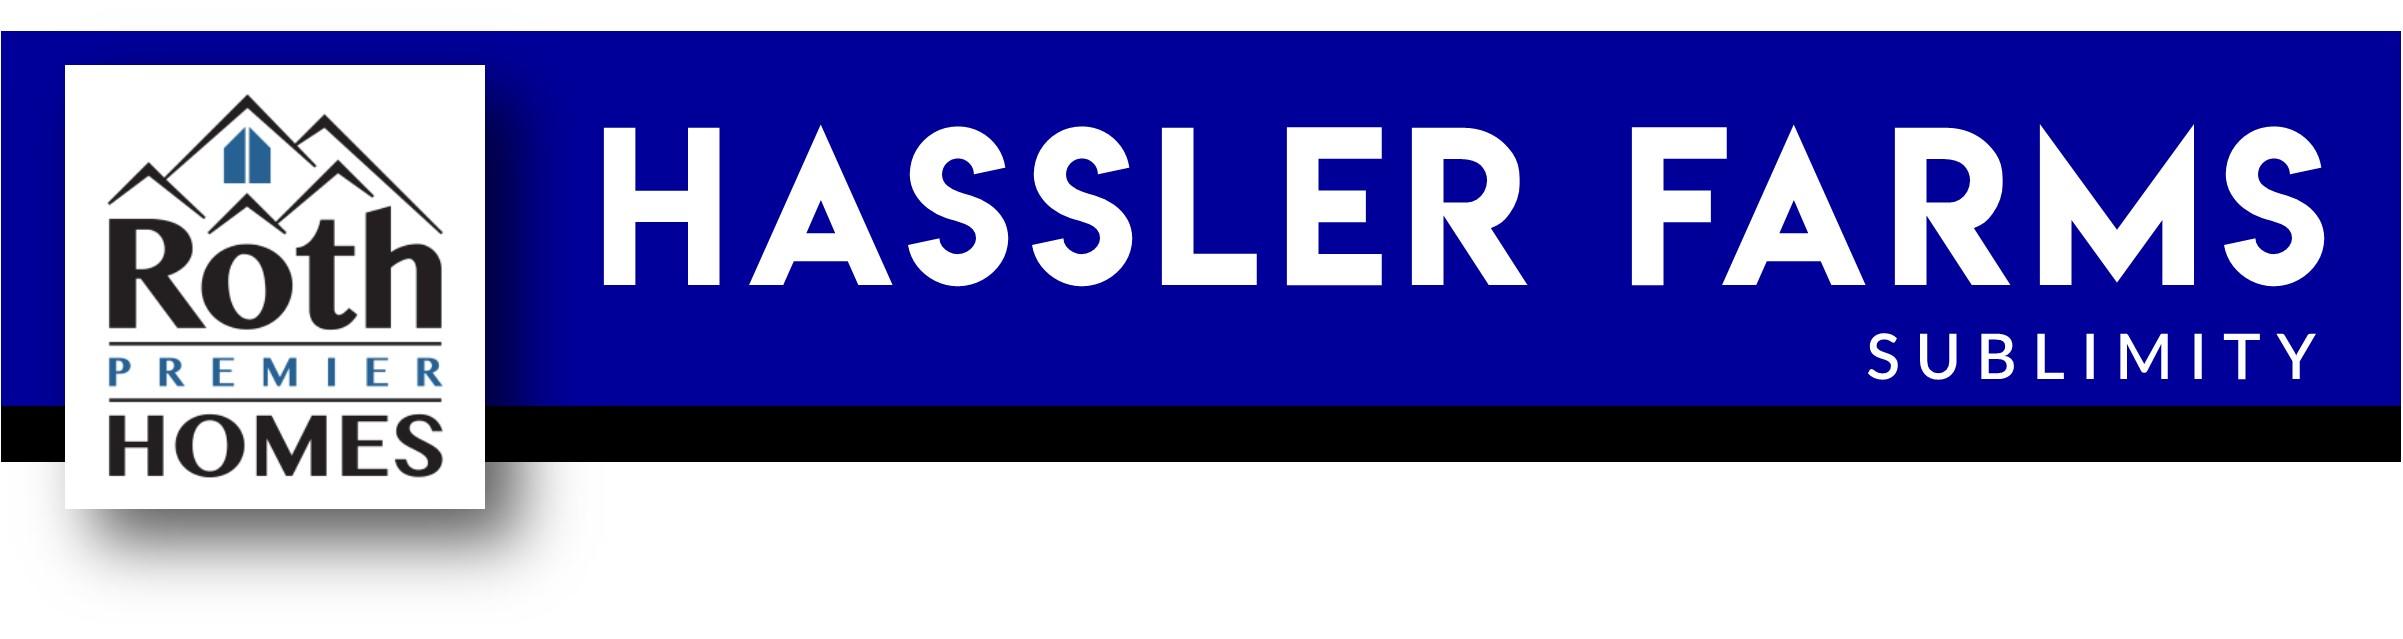 Hassler Farms